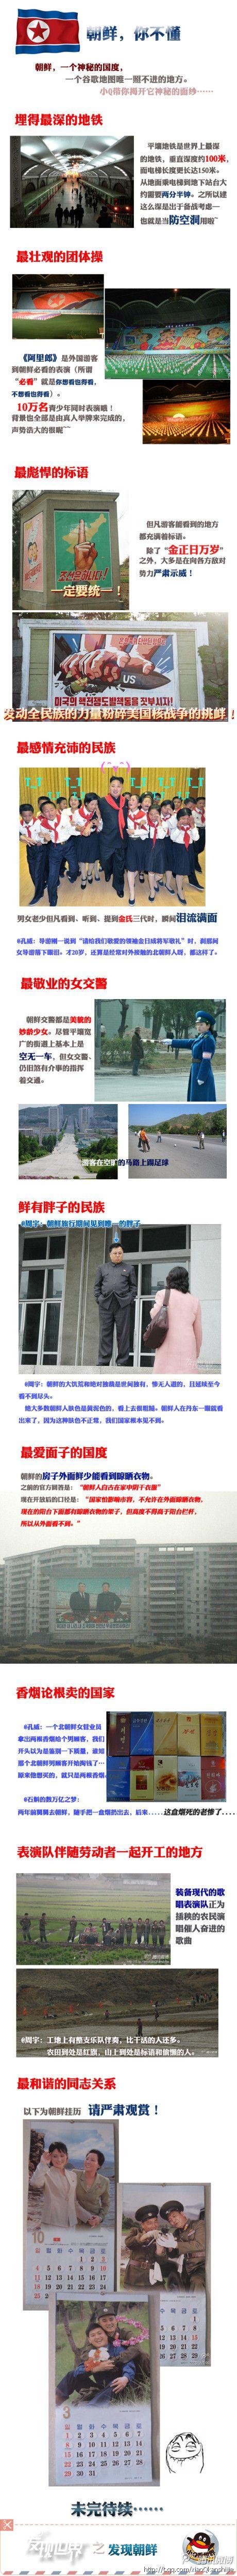 The secret of North Korea...